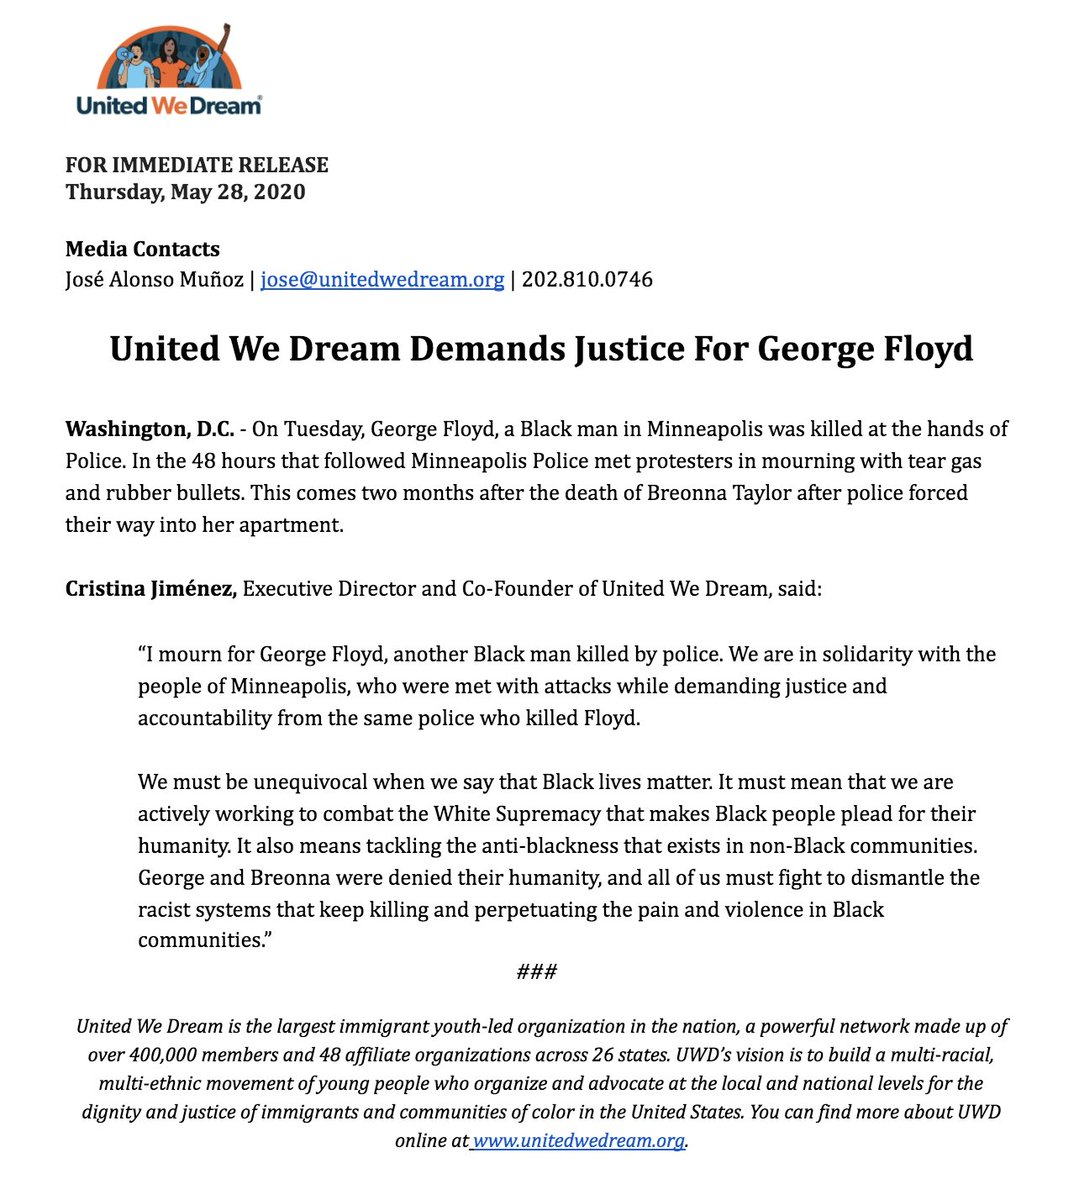 United We Dream Demands Justice For George Floyd. unitedwedream.org/2020/05/united…